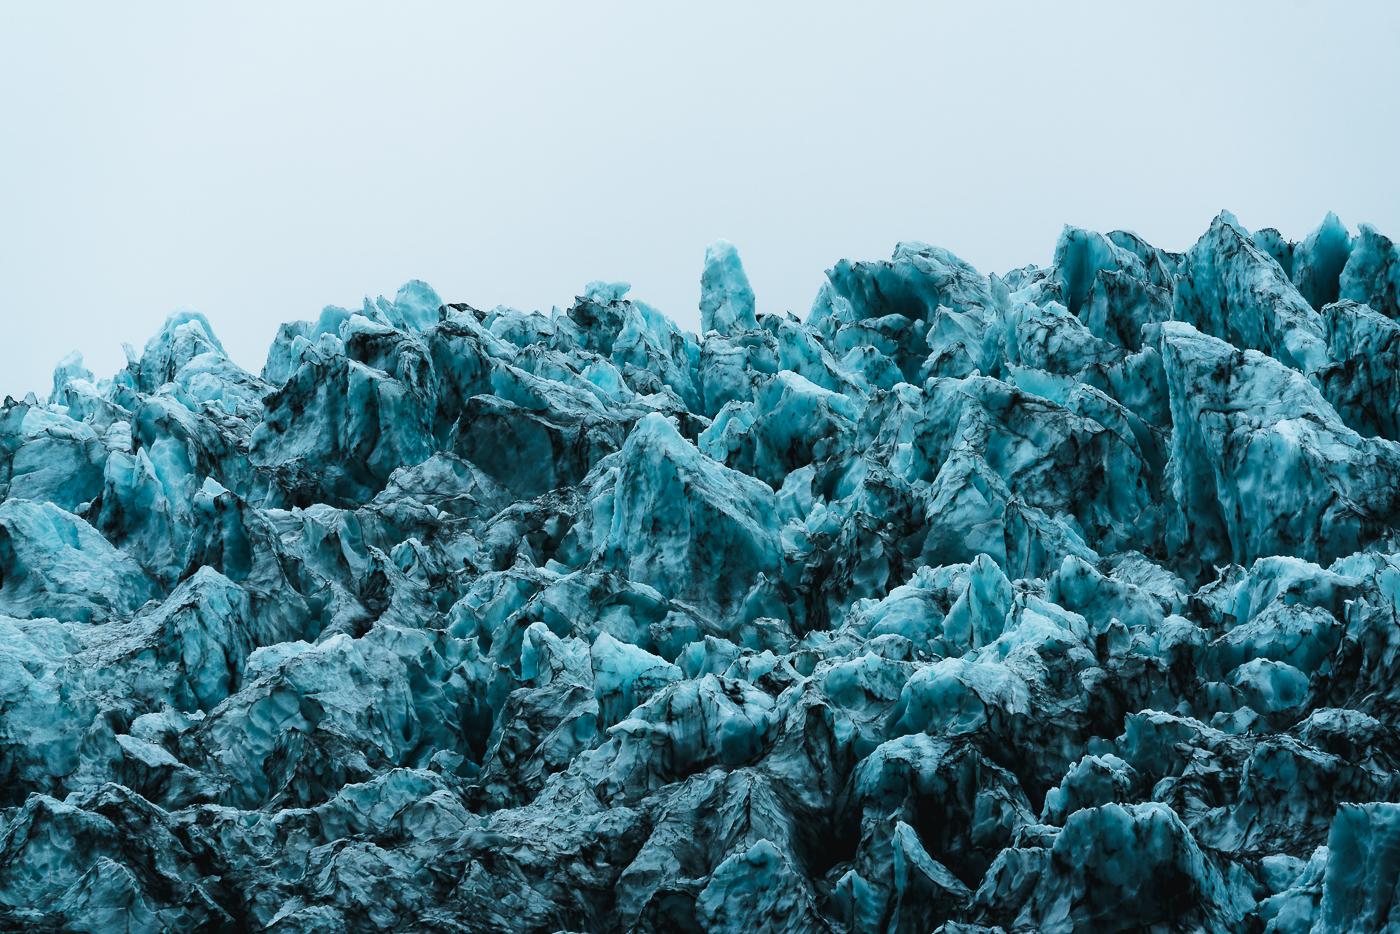 gabornagy_photography_iceland_glacier37.jpg